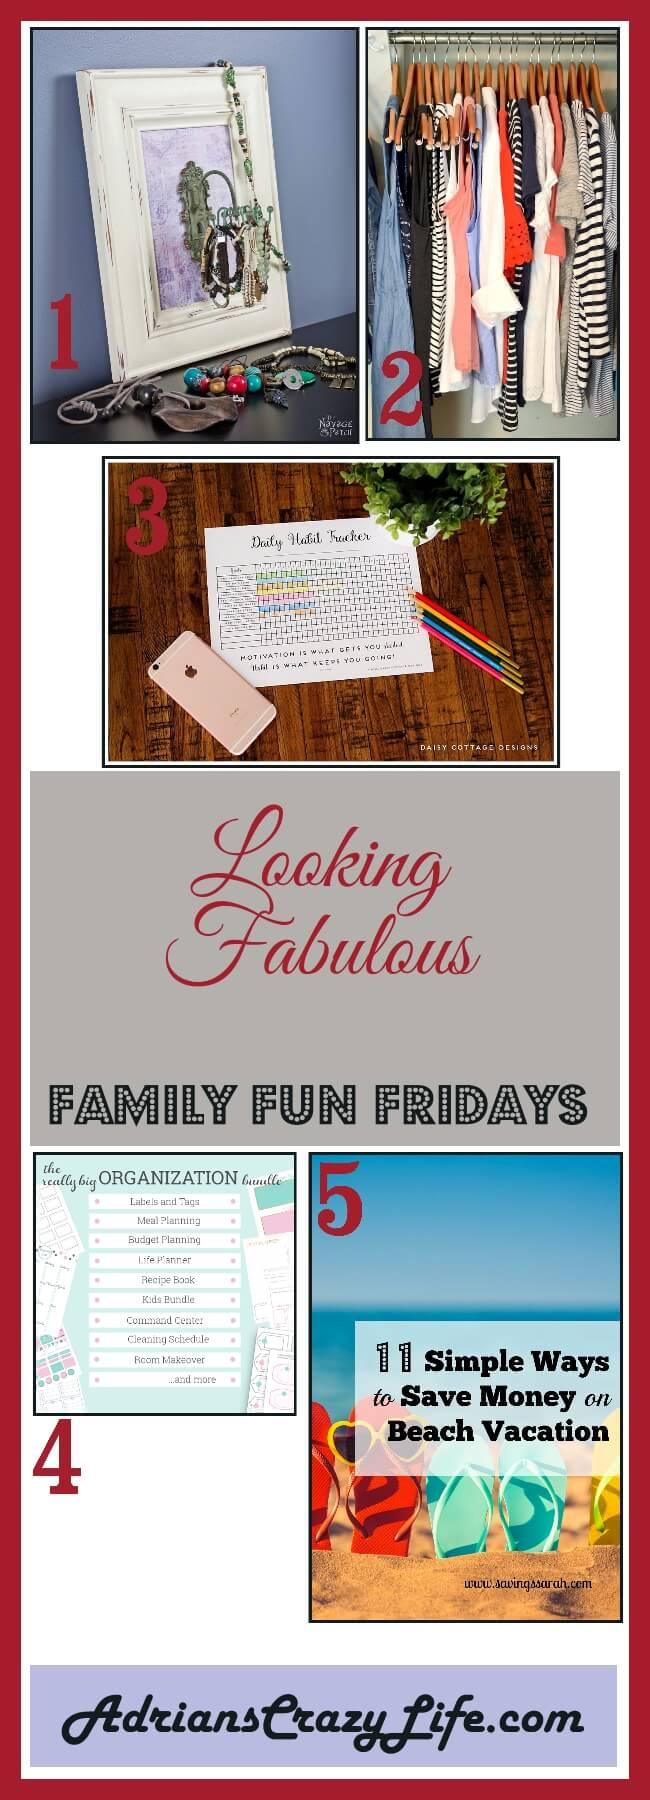 FamilyFunFridays-004